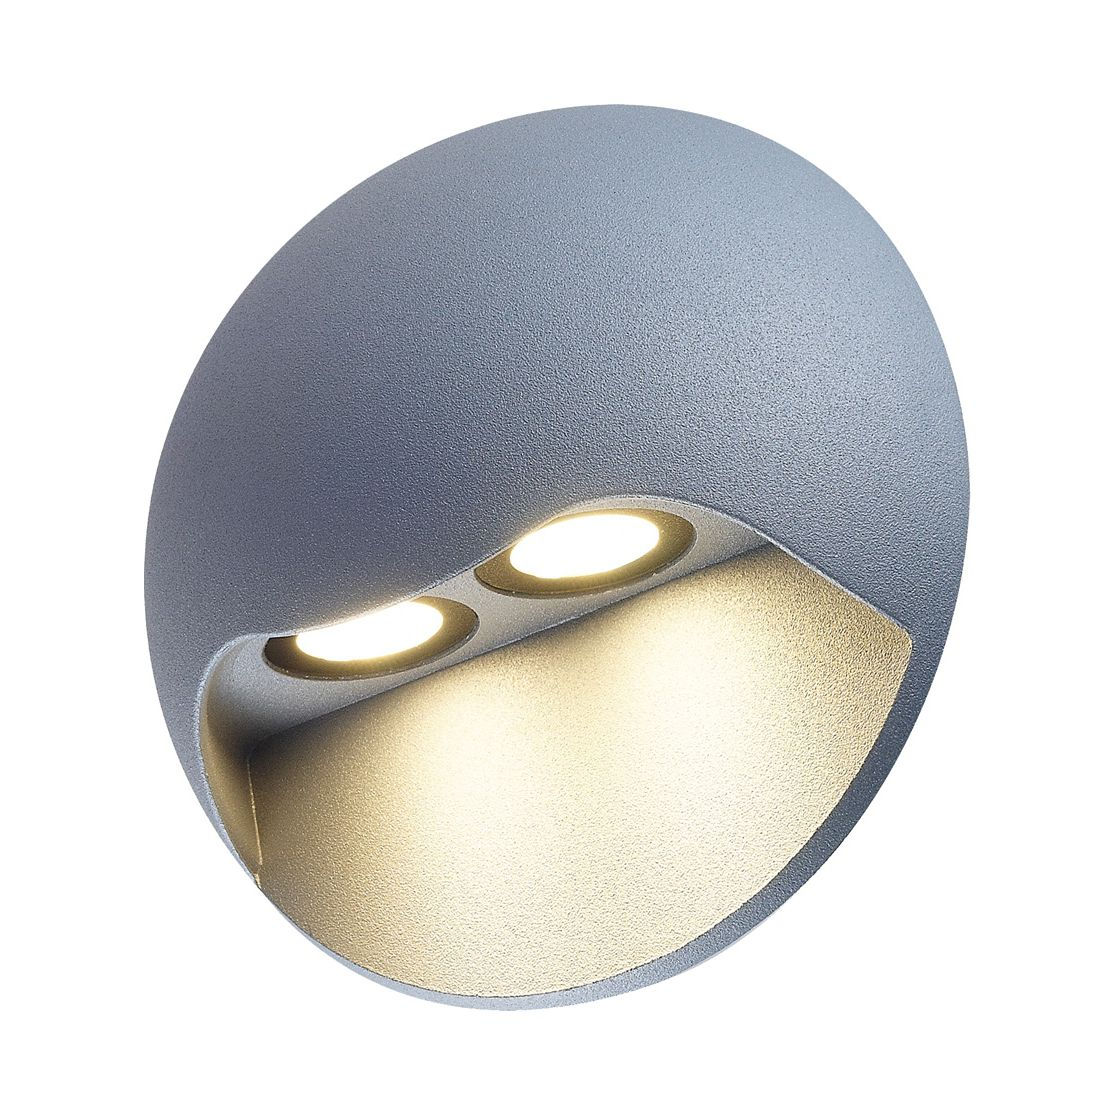 EEK A+, LED Außenwandleuchte Cycle II 2-flammig - Silber Aluminium, Näve